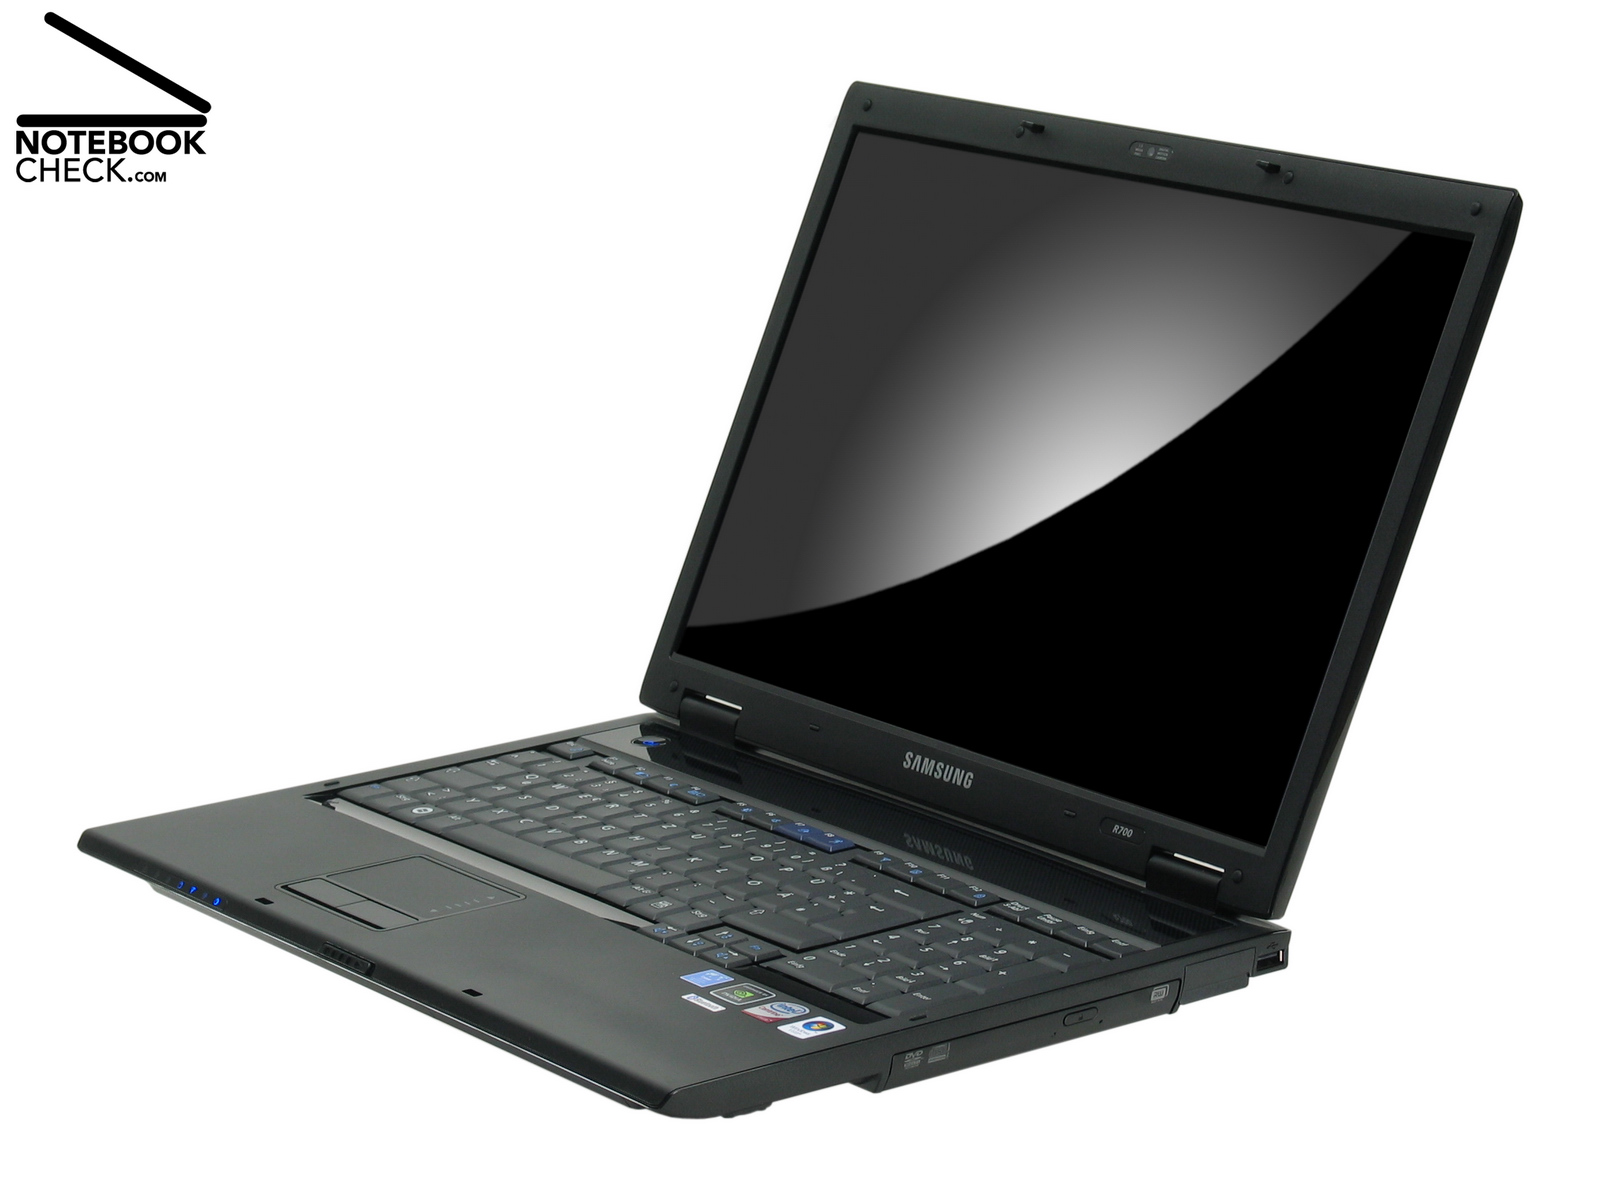 Acer Aspire 9810 Marvell LAN X64 Driver Download